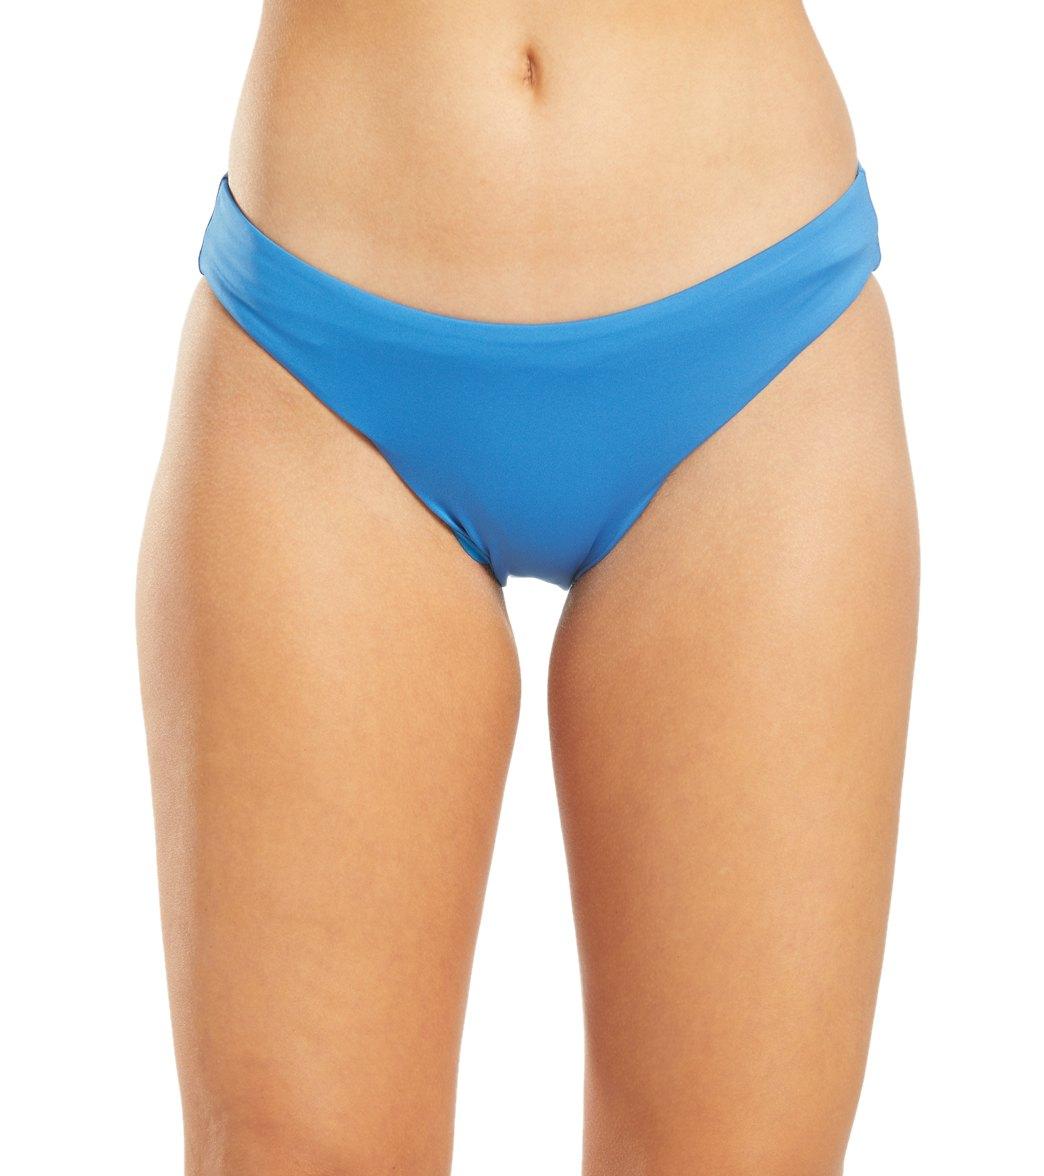 Nike Scoop Bikini Bottom